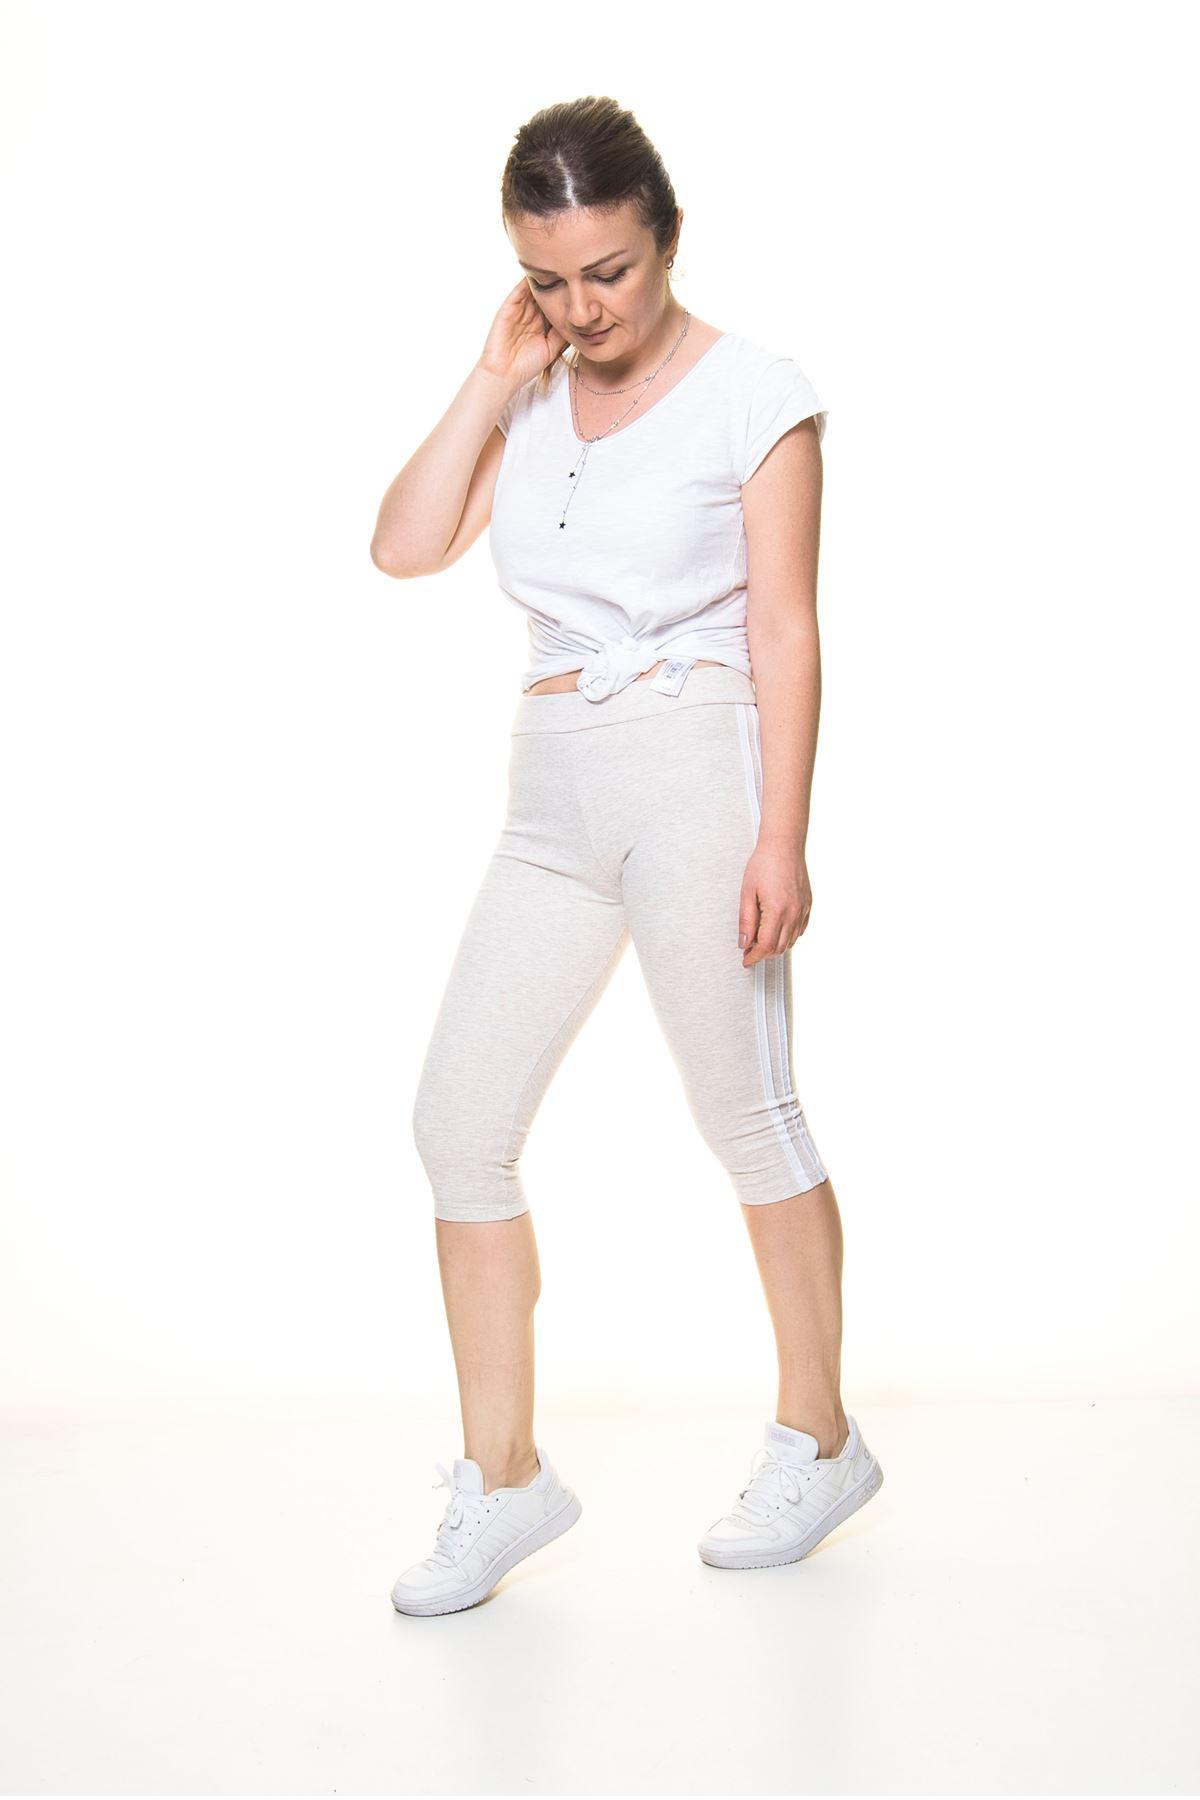 Kadın Spor Çizgili Bej Kapri Tayt 11C-4017